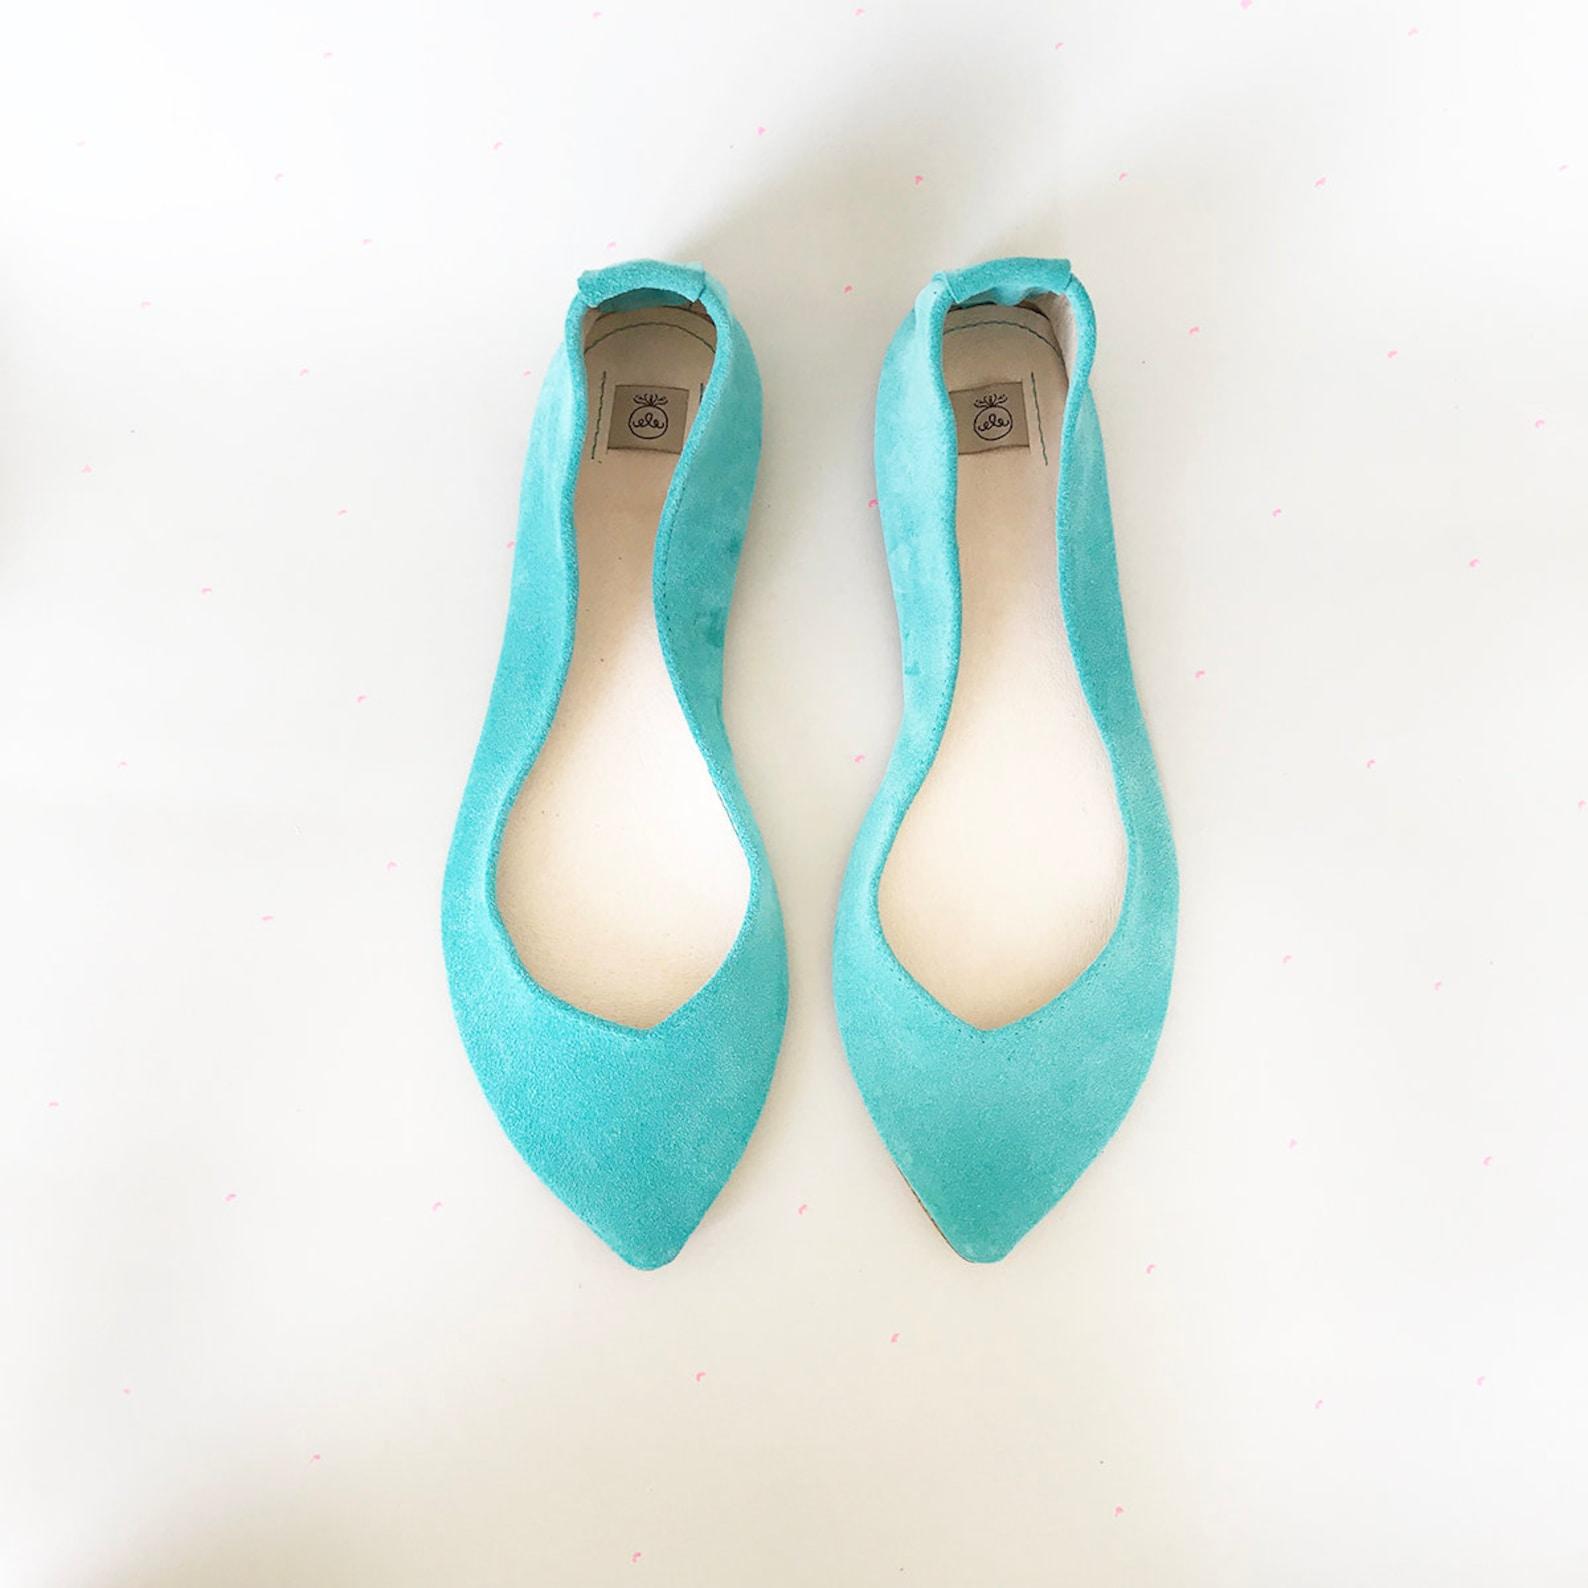 wedding shoes. robin egg bridal flats. low heel shoes. pointy ballet flats. leather ballerinas. bridal flats. bridesmaids gift.